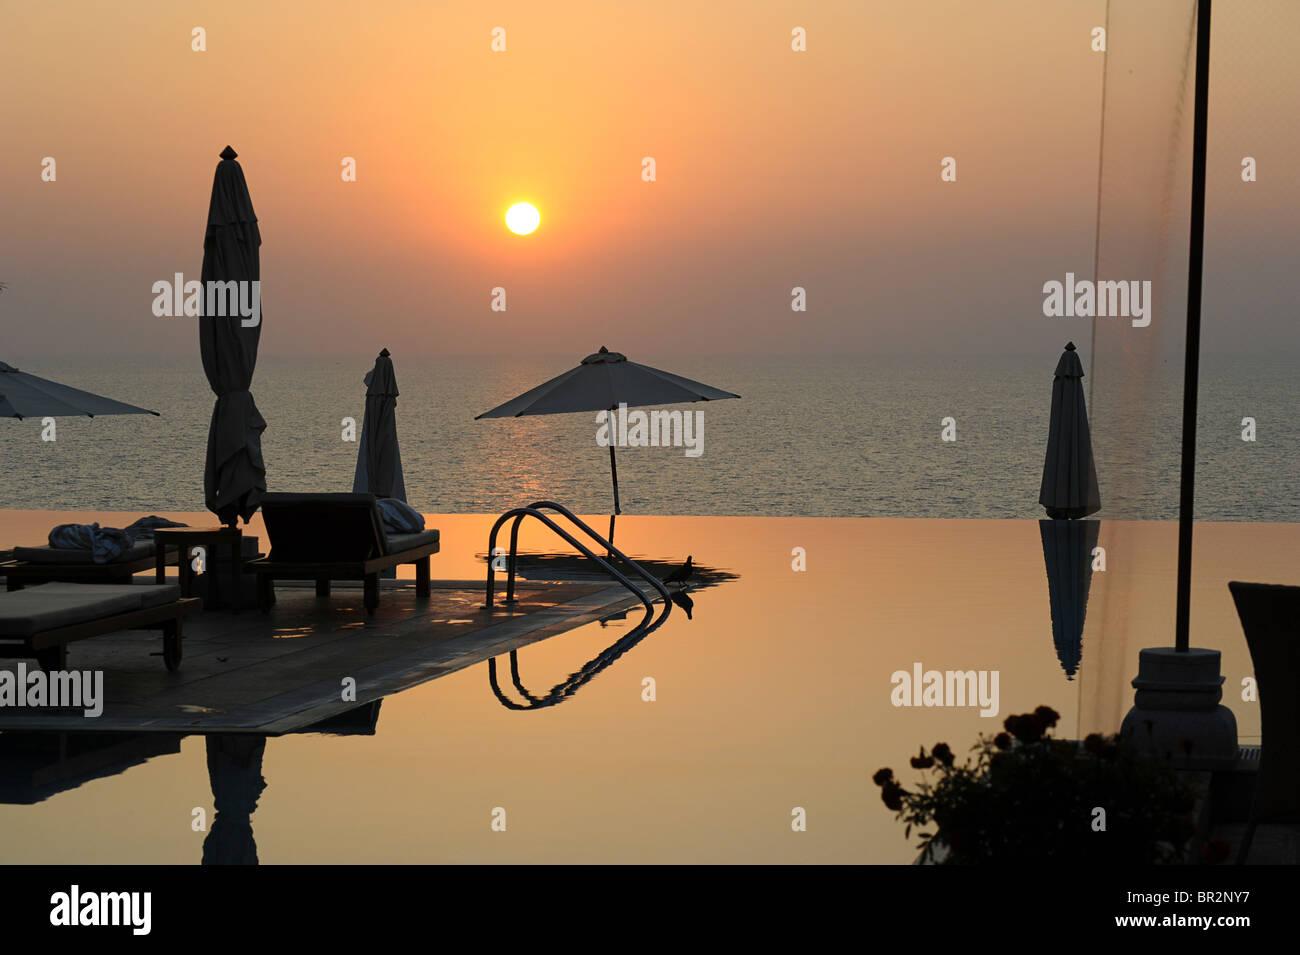 Hotel infinity pool at sunset, Kovalam, Kerala, India Stock Photo